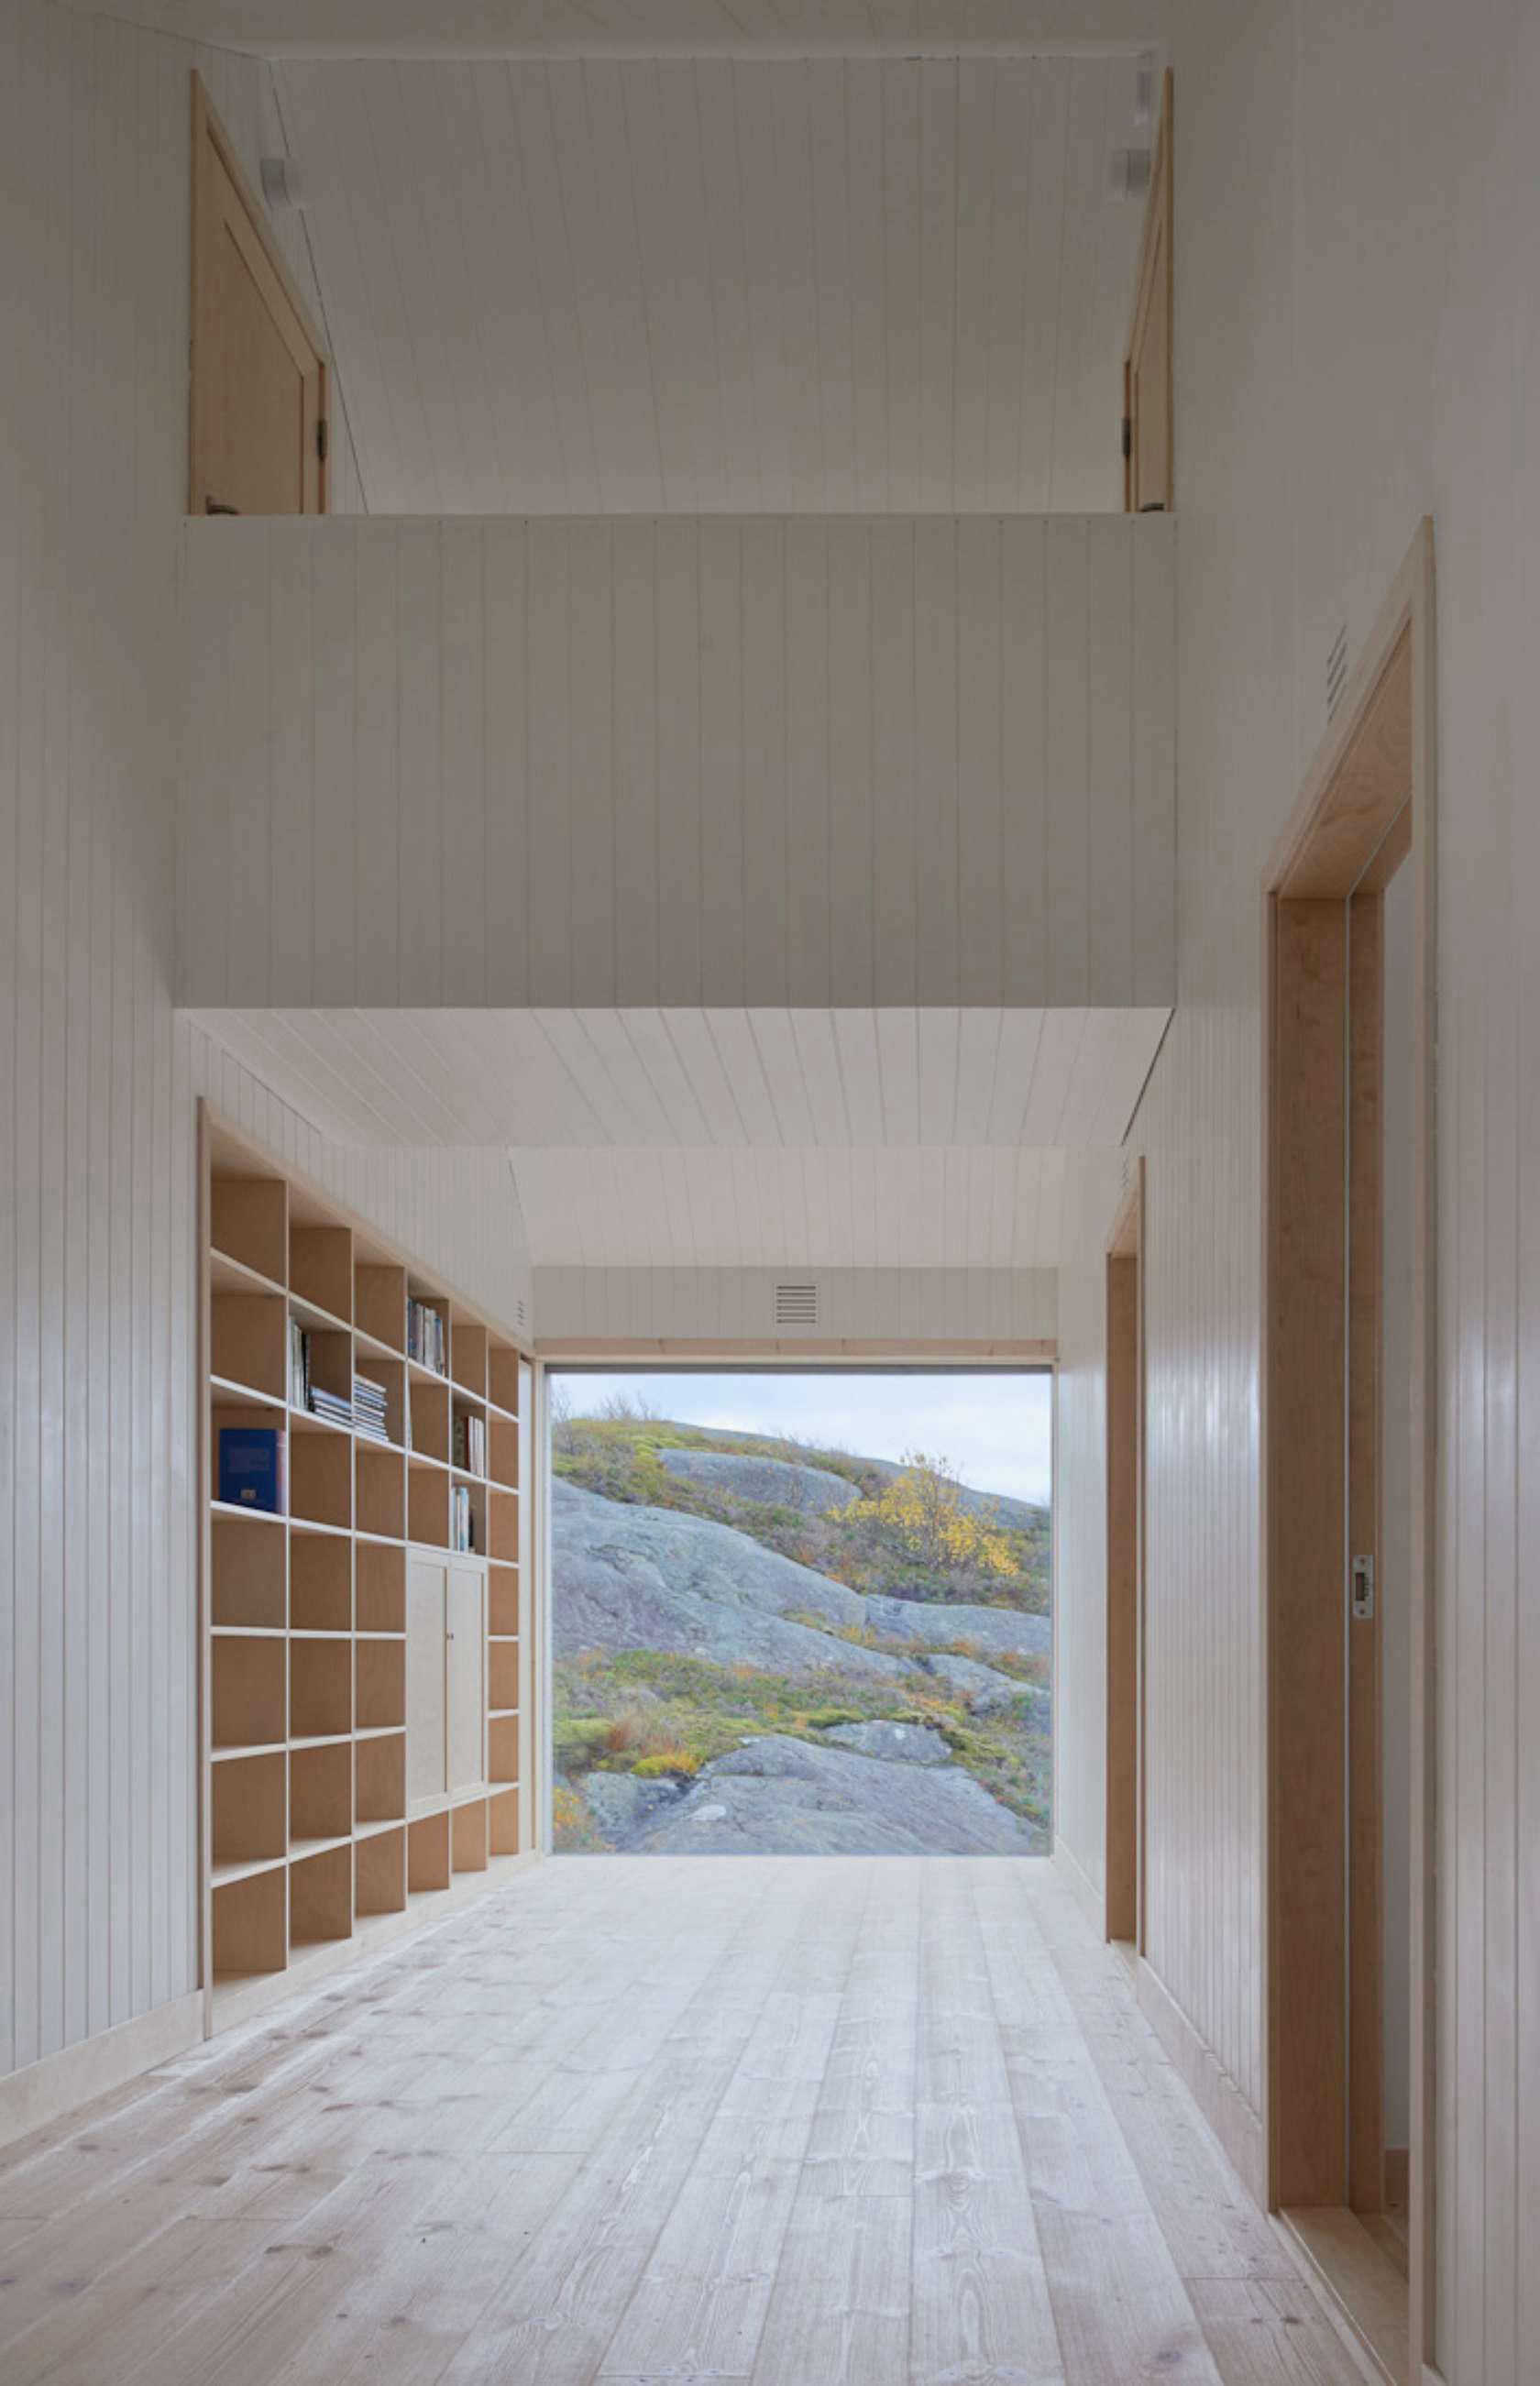 summerhaus nauste by kolman boye architects 16